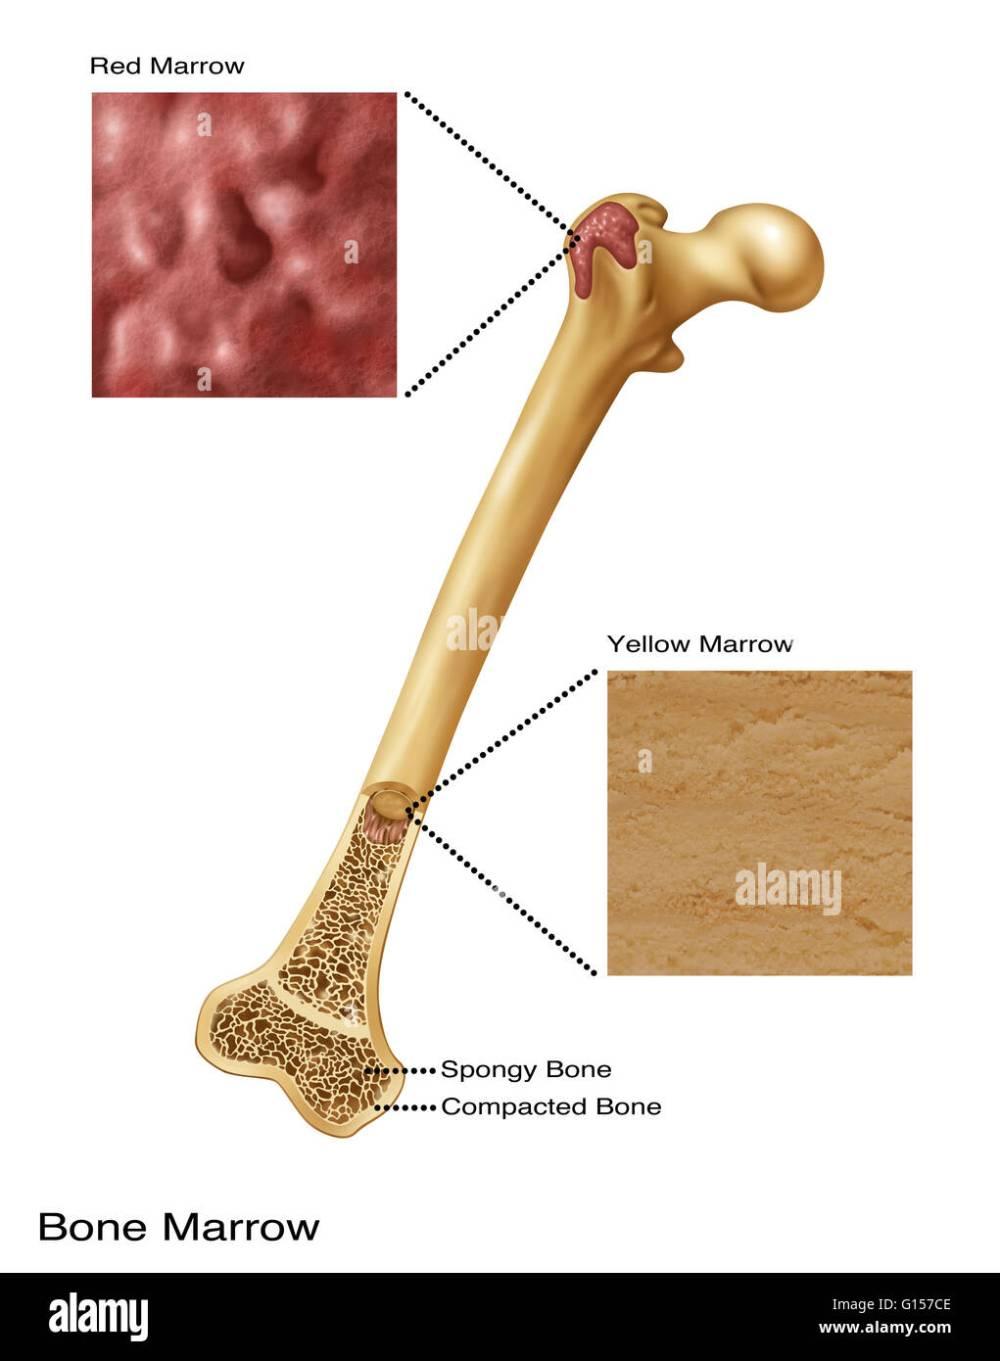 medium resolution of illustration of bone marrow top diagram shows red bone marrow bottom diagram shows yellow